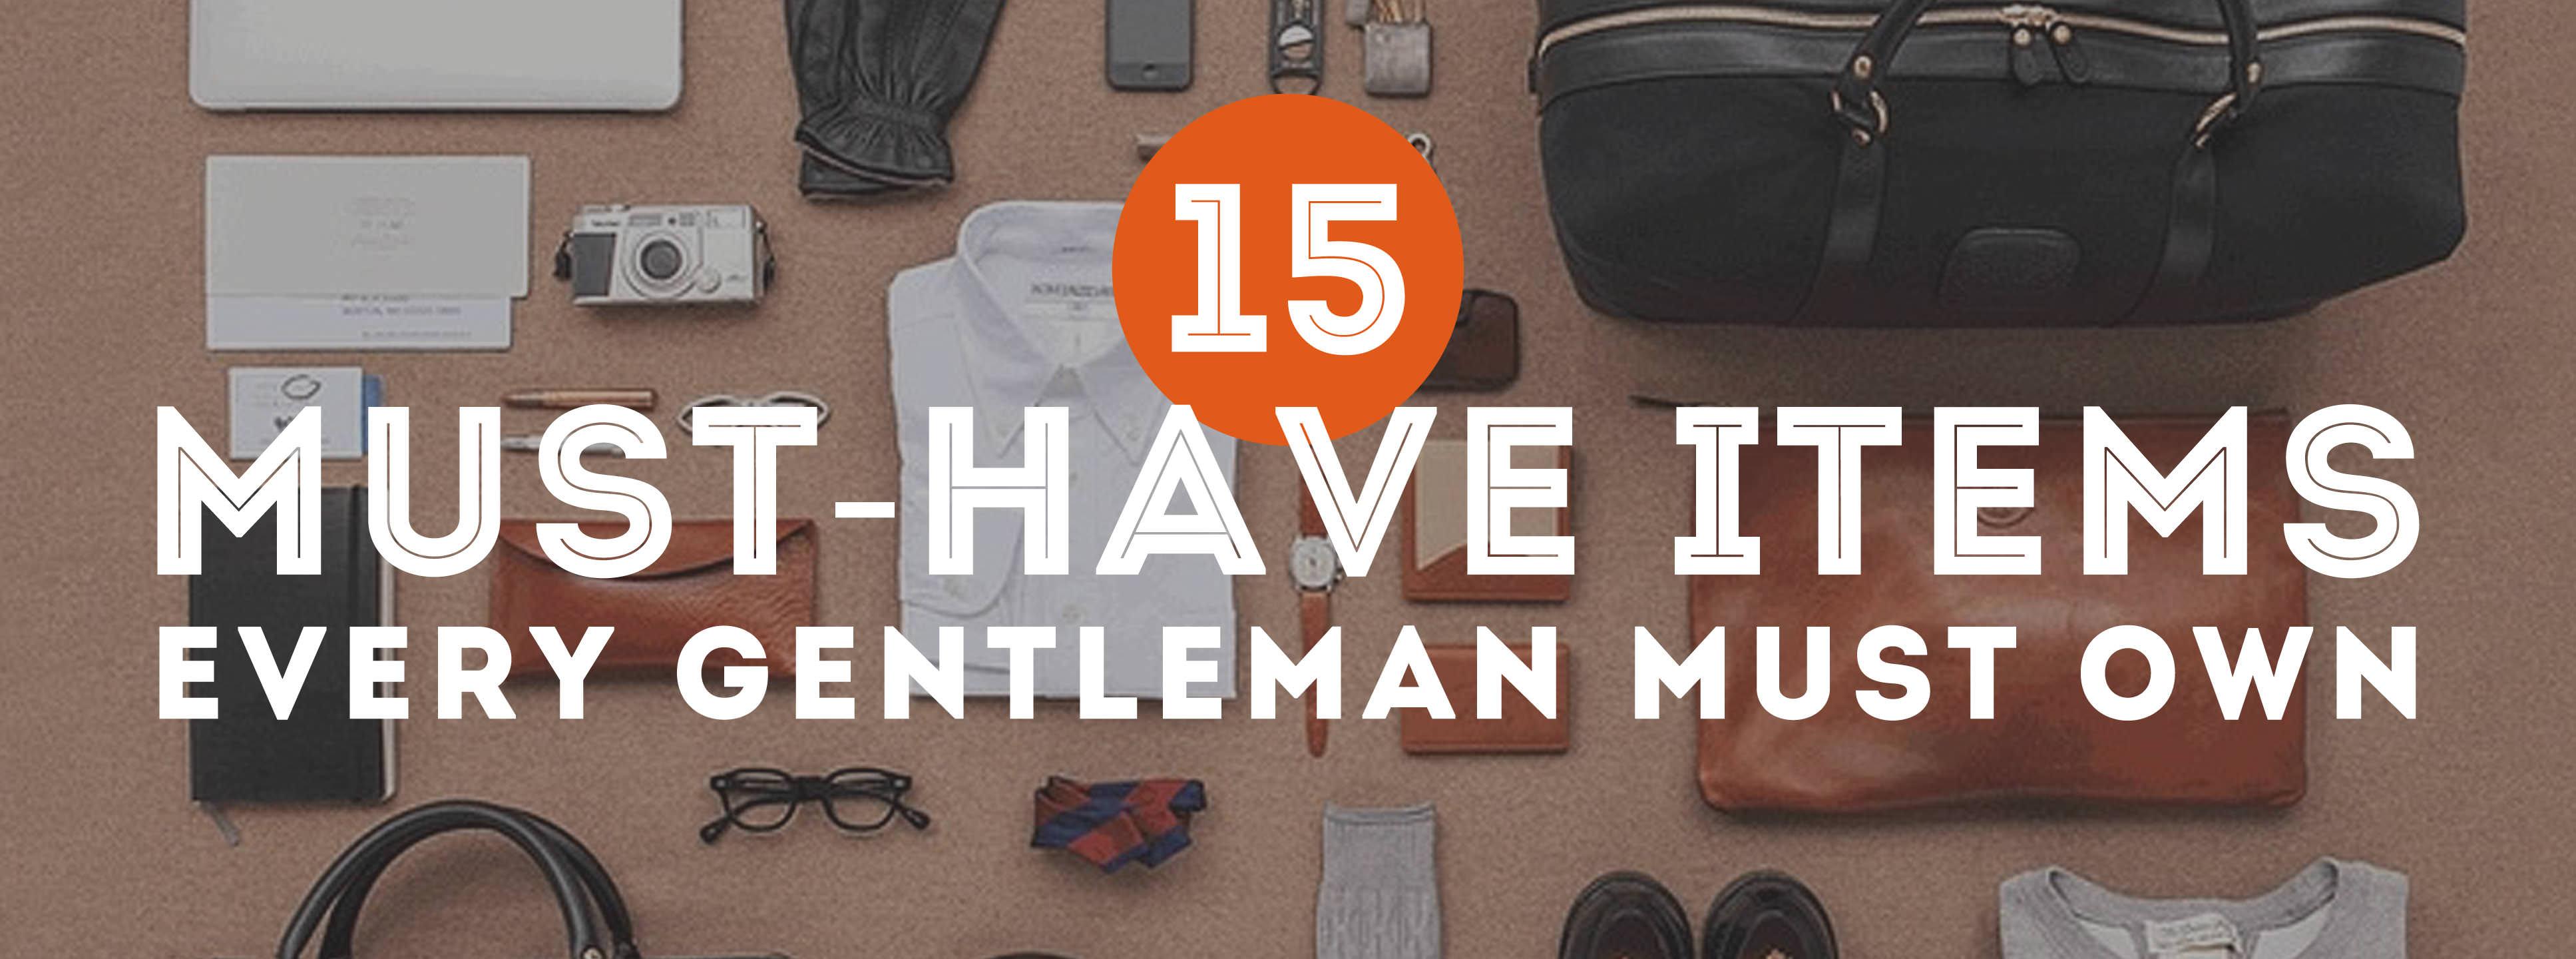 18 Must-Have Items Every Gentleman Should Own — Gentleman s Gazette d00958513a63b